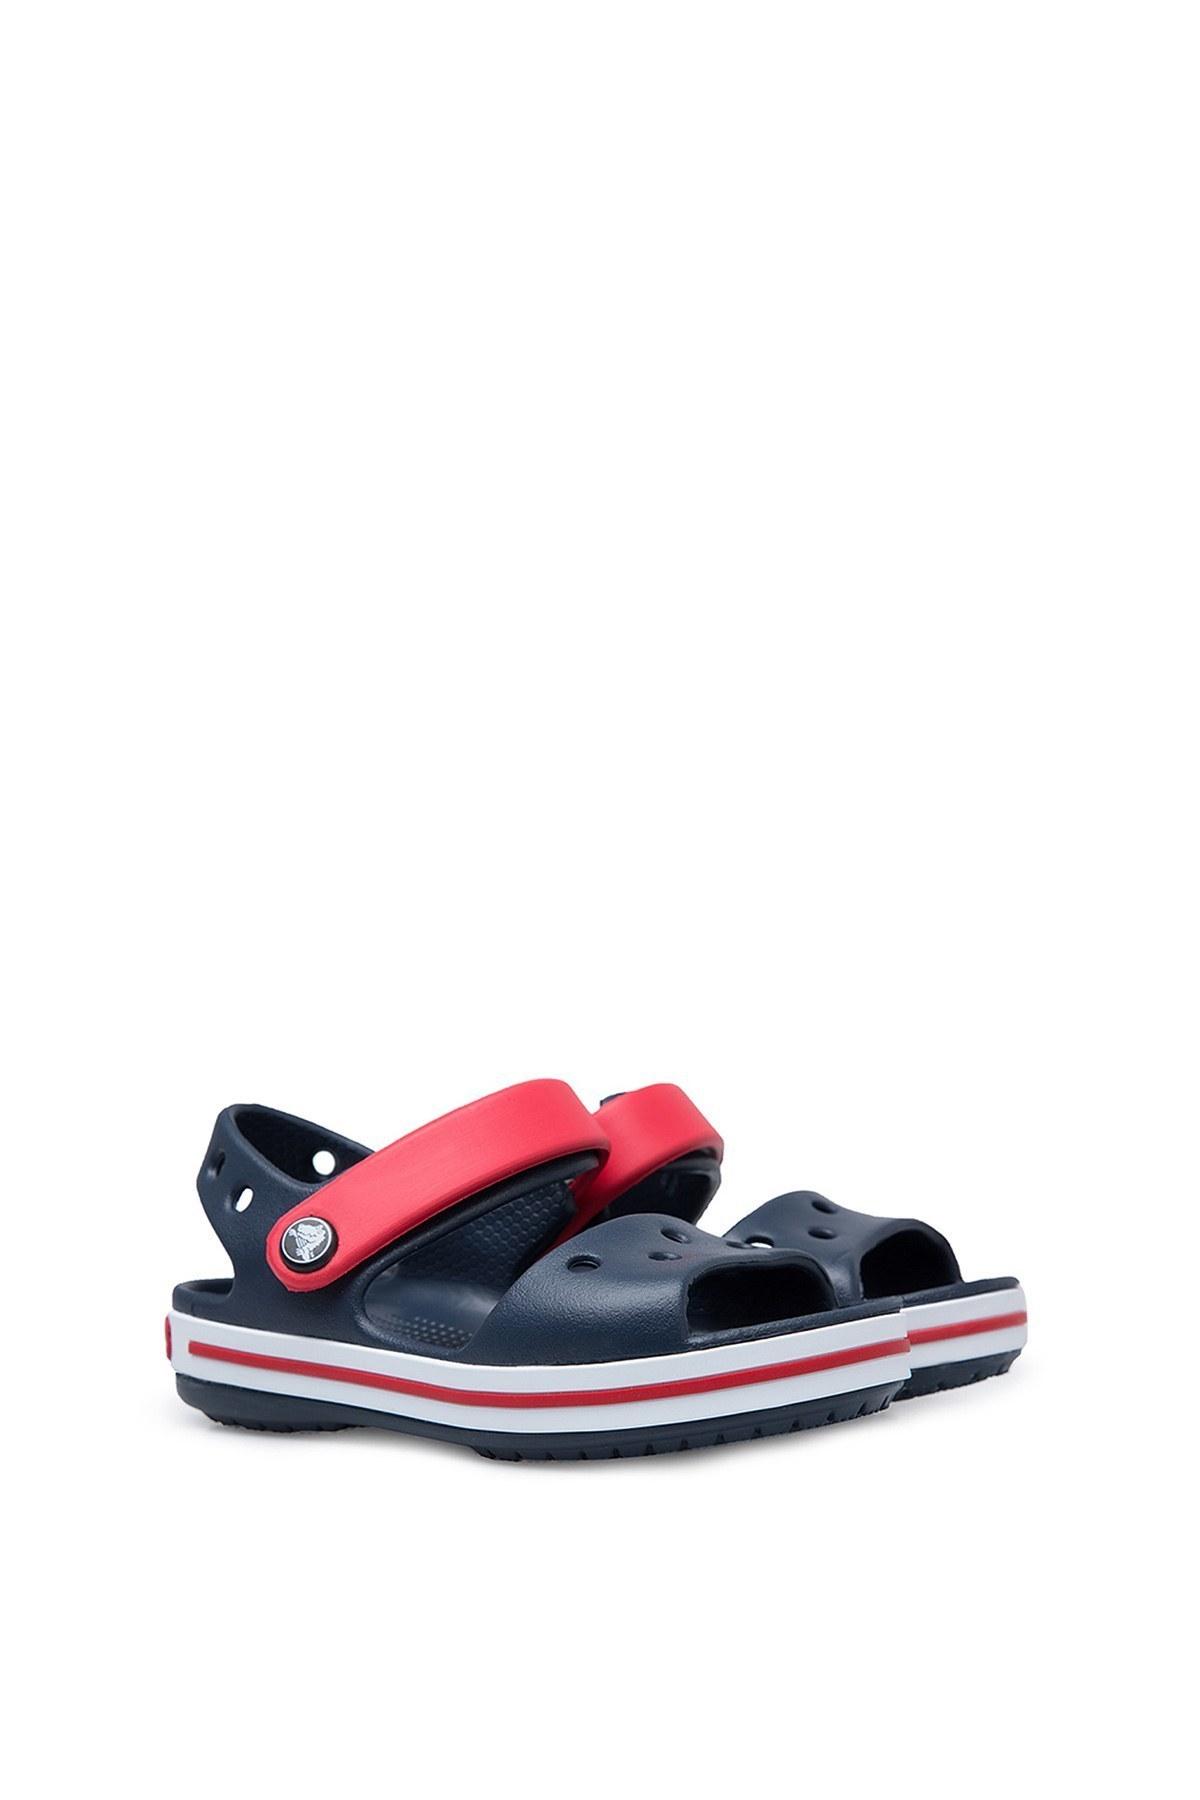 Crocs Crocband Çocuk Sandalet 12856-485 LACİVERT